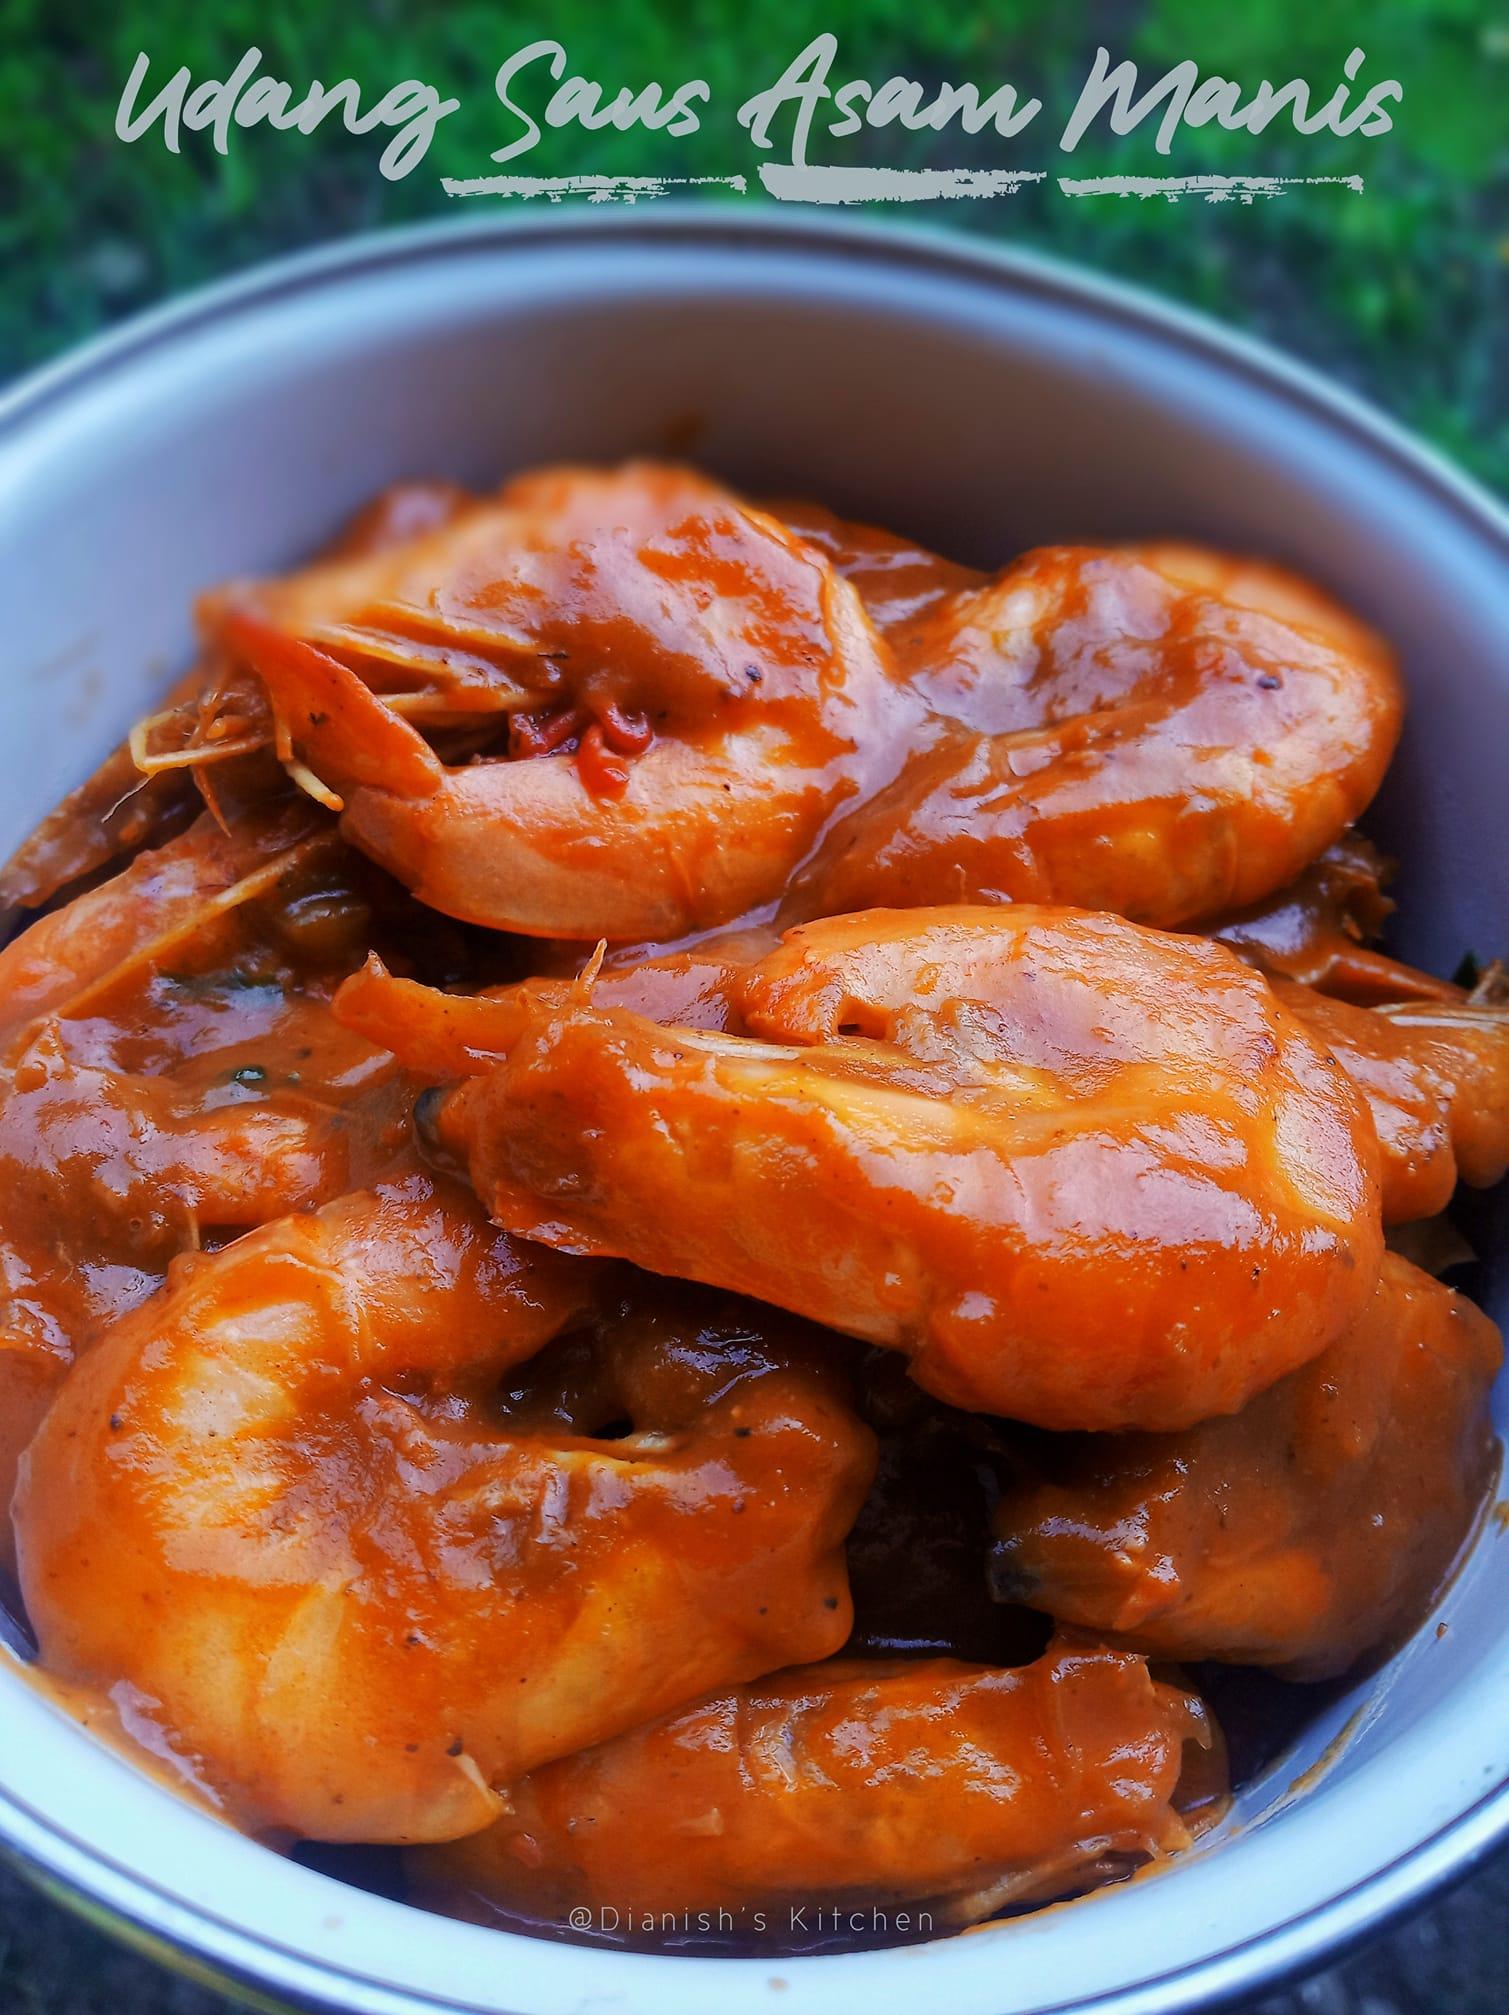 Bumbu Asam Manis Udang : bumbu, manis, udang, SWEET, SAFETY, SHRIMP, Recipe, Dianish's, Kitchen